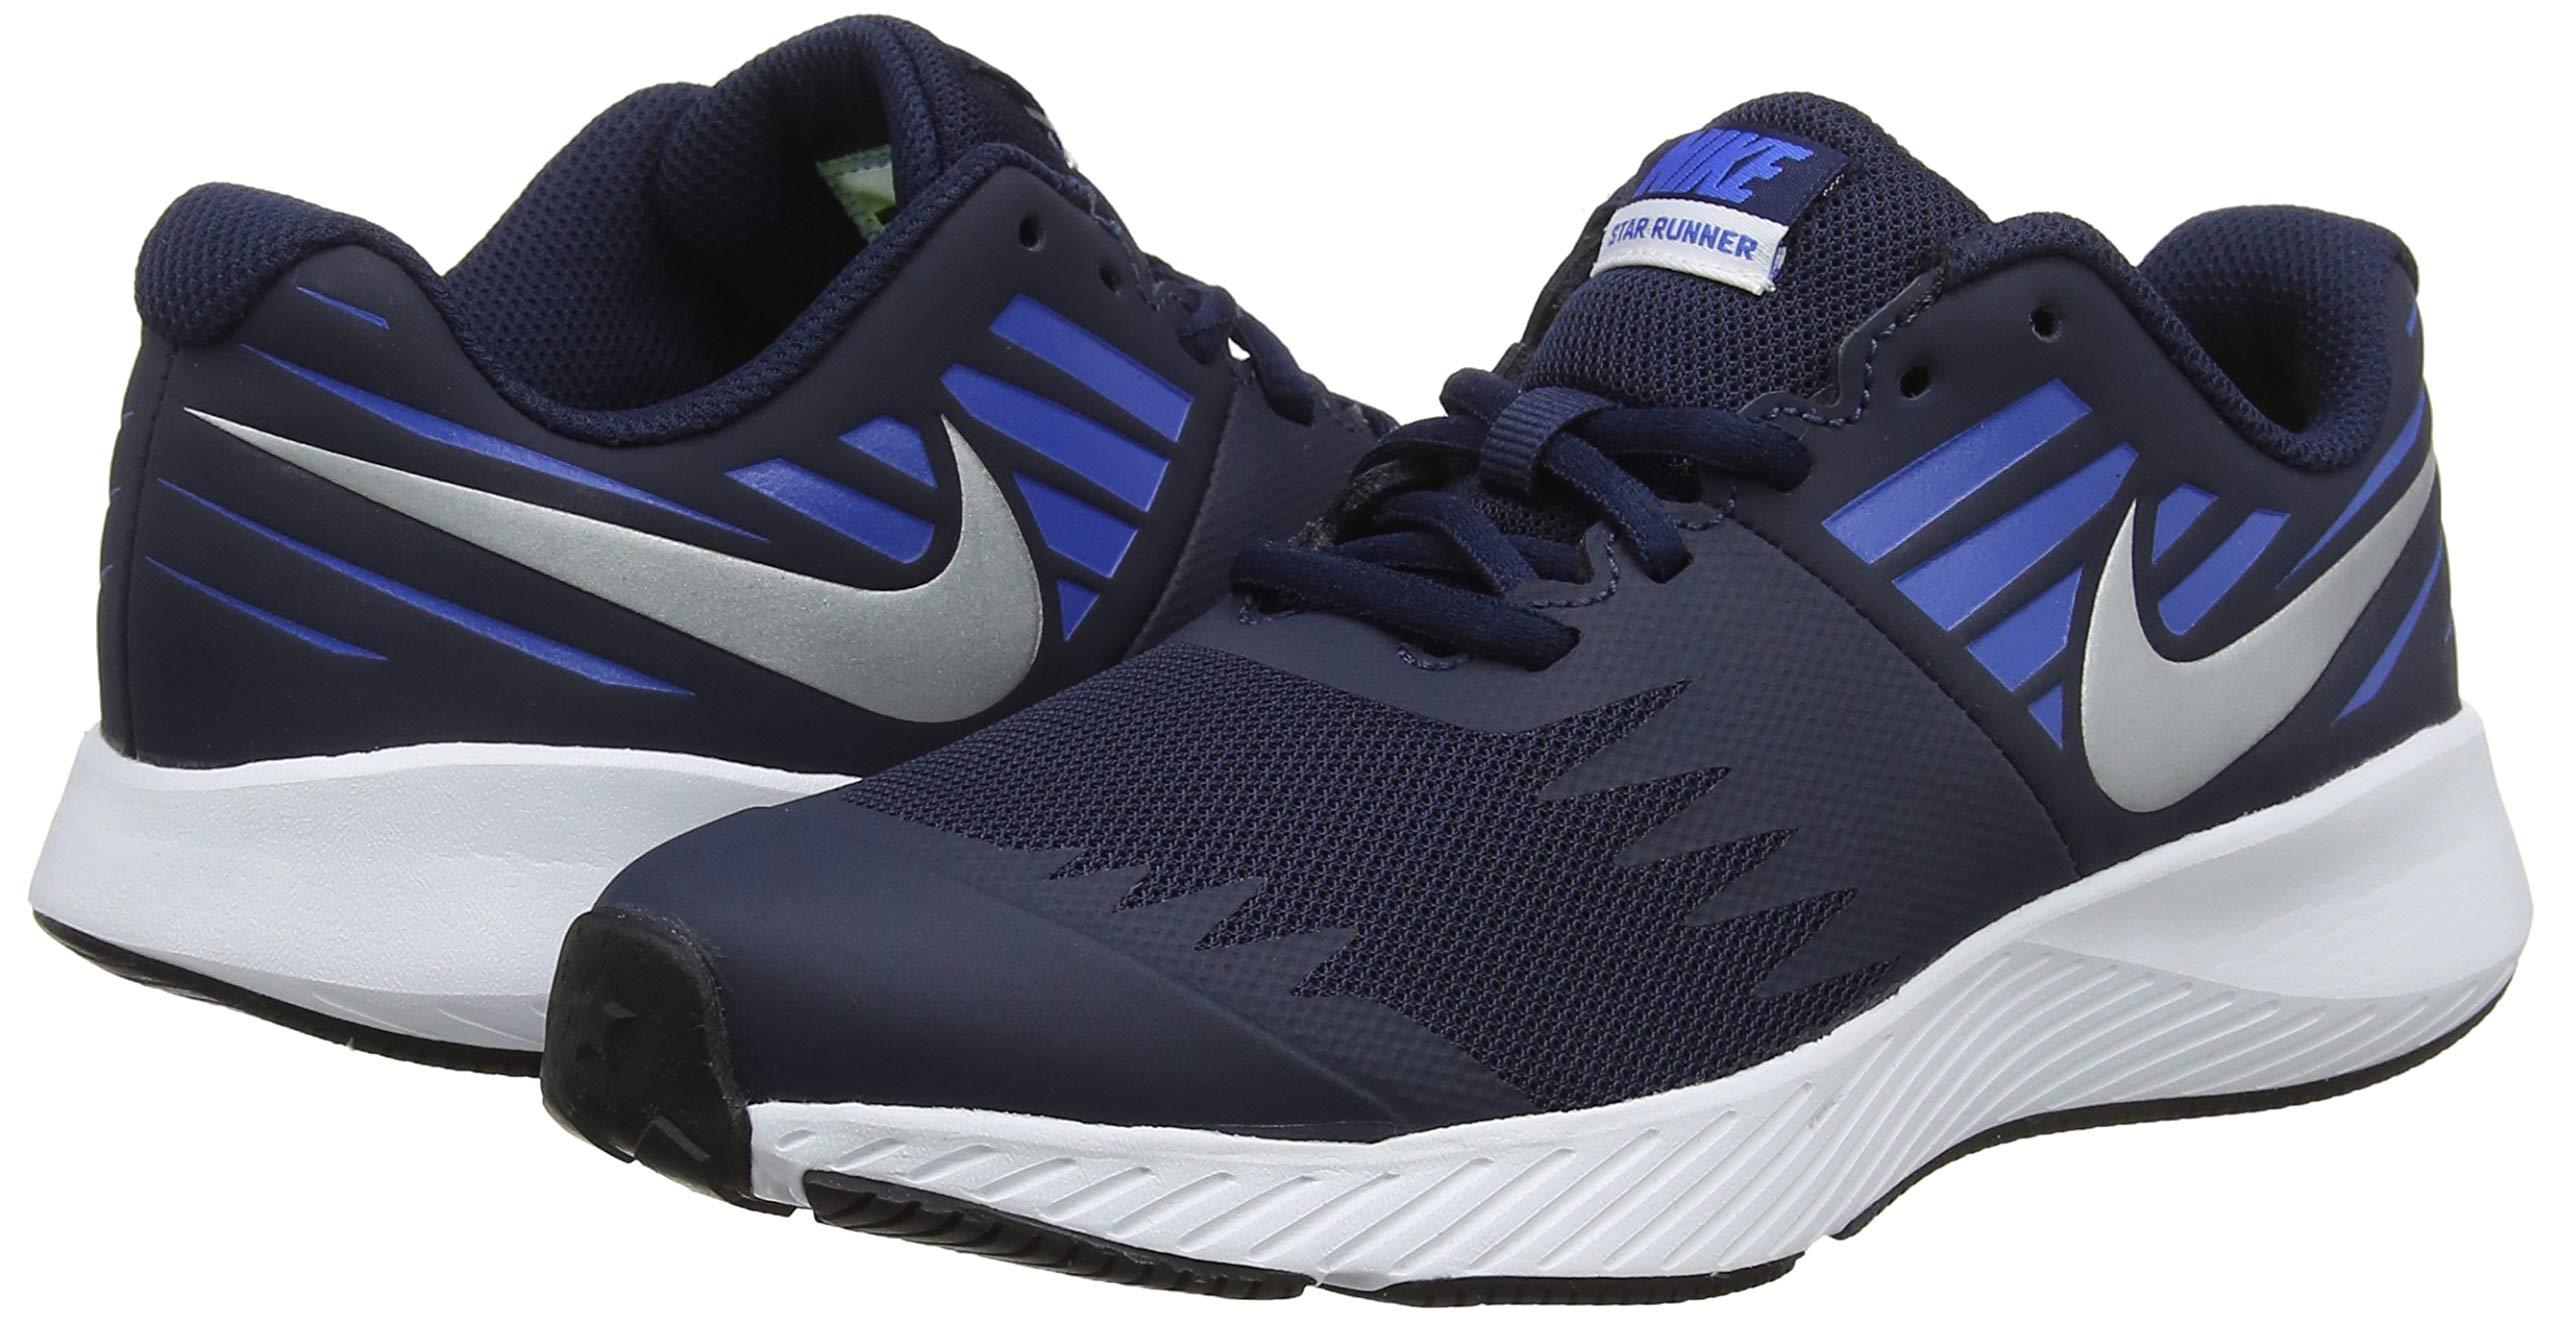 Nike Boy's Star Runner (GS) Running Shoe Obsidian/Metallic Silver/Signal Blue Size 3.5 M US by Nike (Image #5)